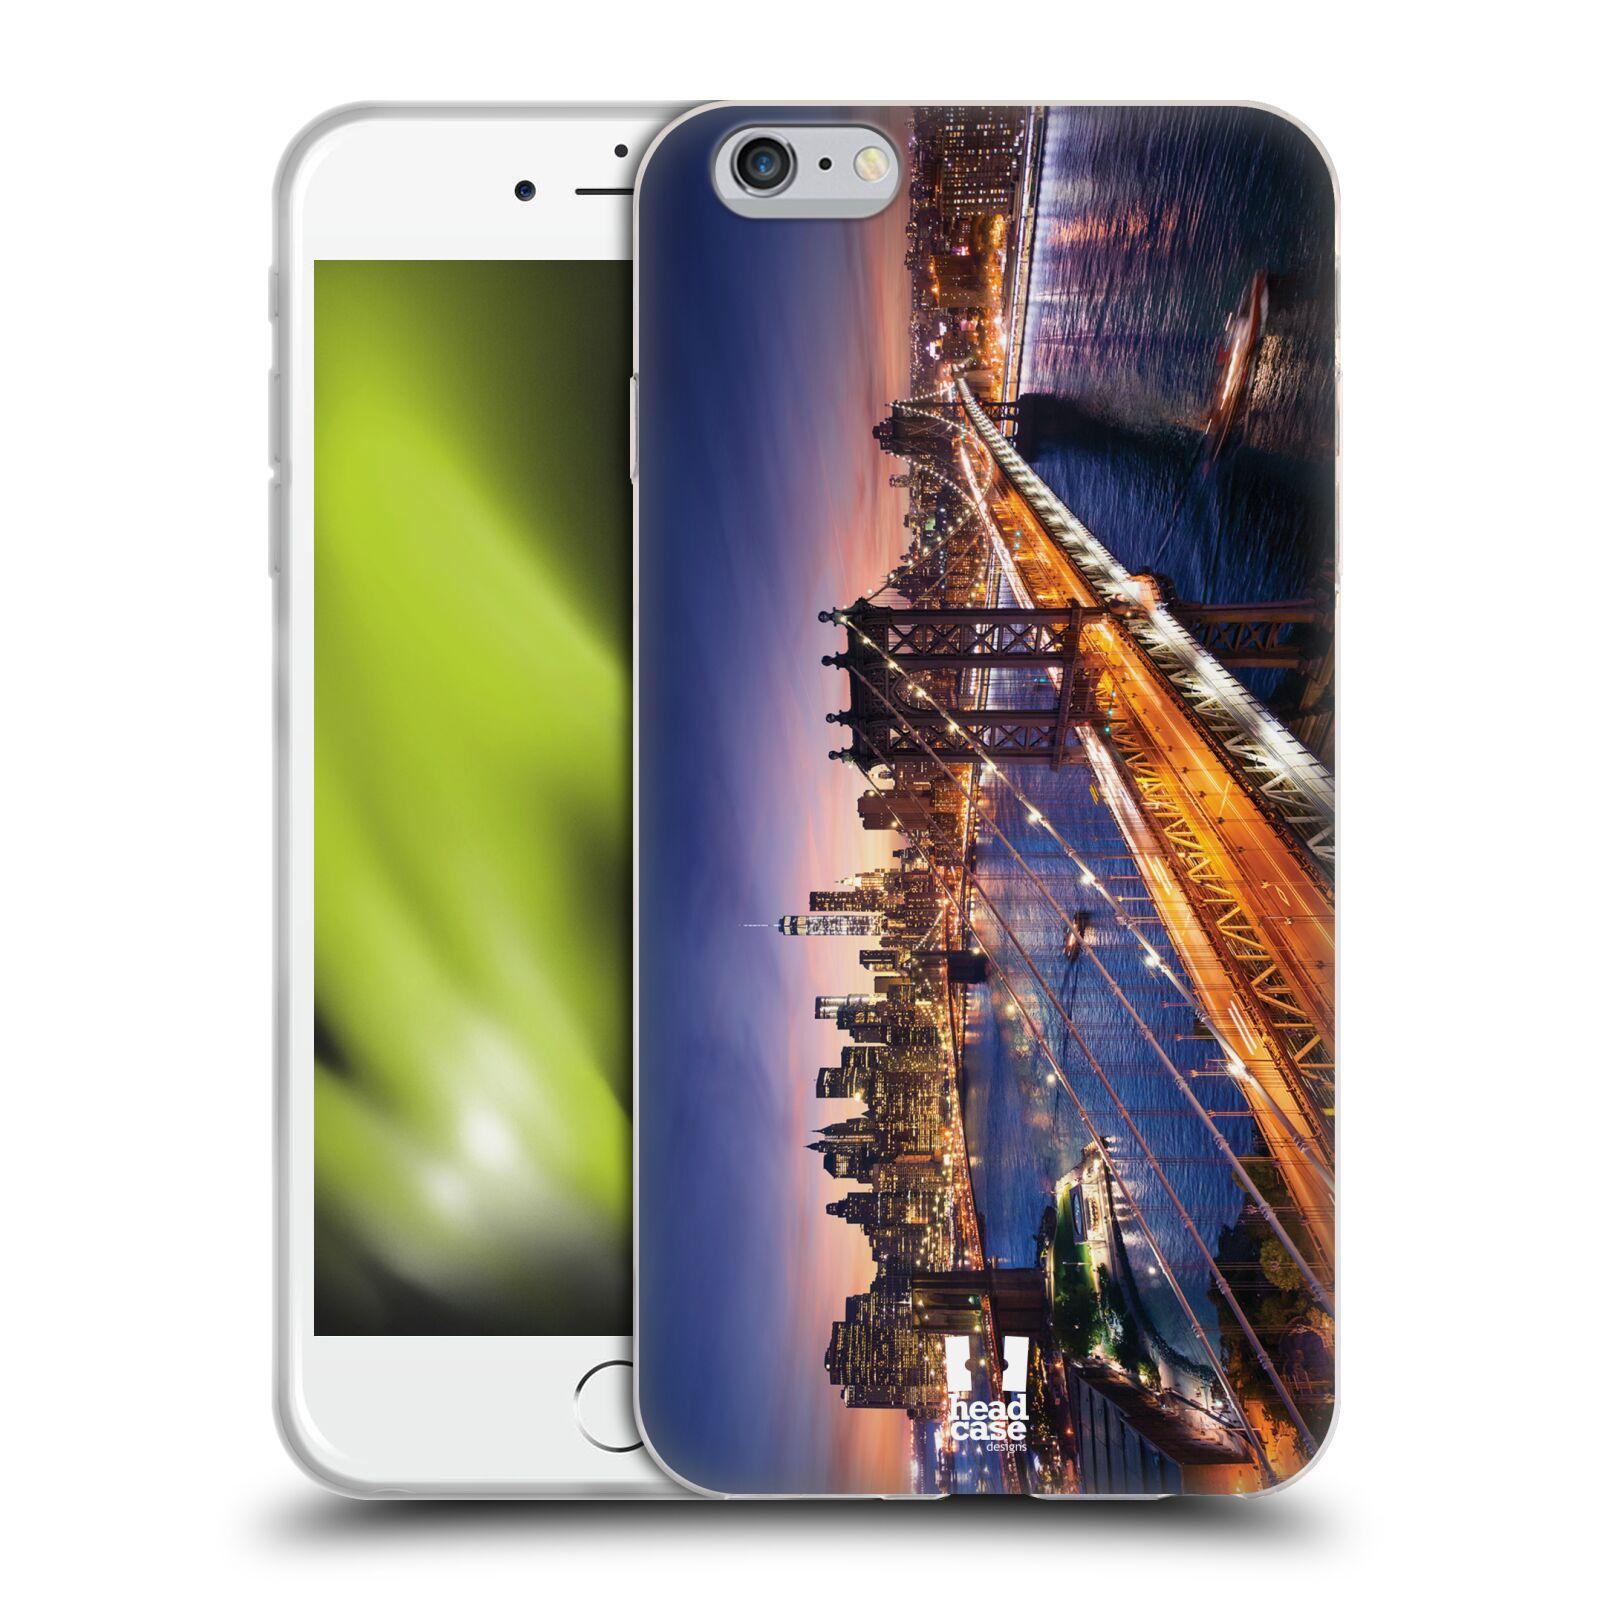 HEAD CASE silikonový obal na mobil Apple Iphone 6 PLUS  6S PLUS vzor  Panoramata měst empty 1926c185963